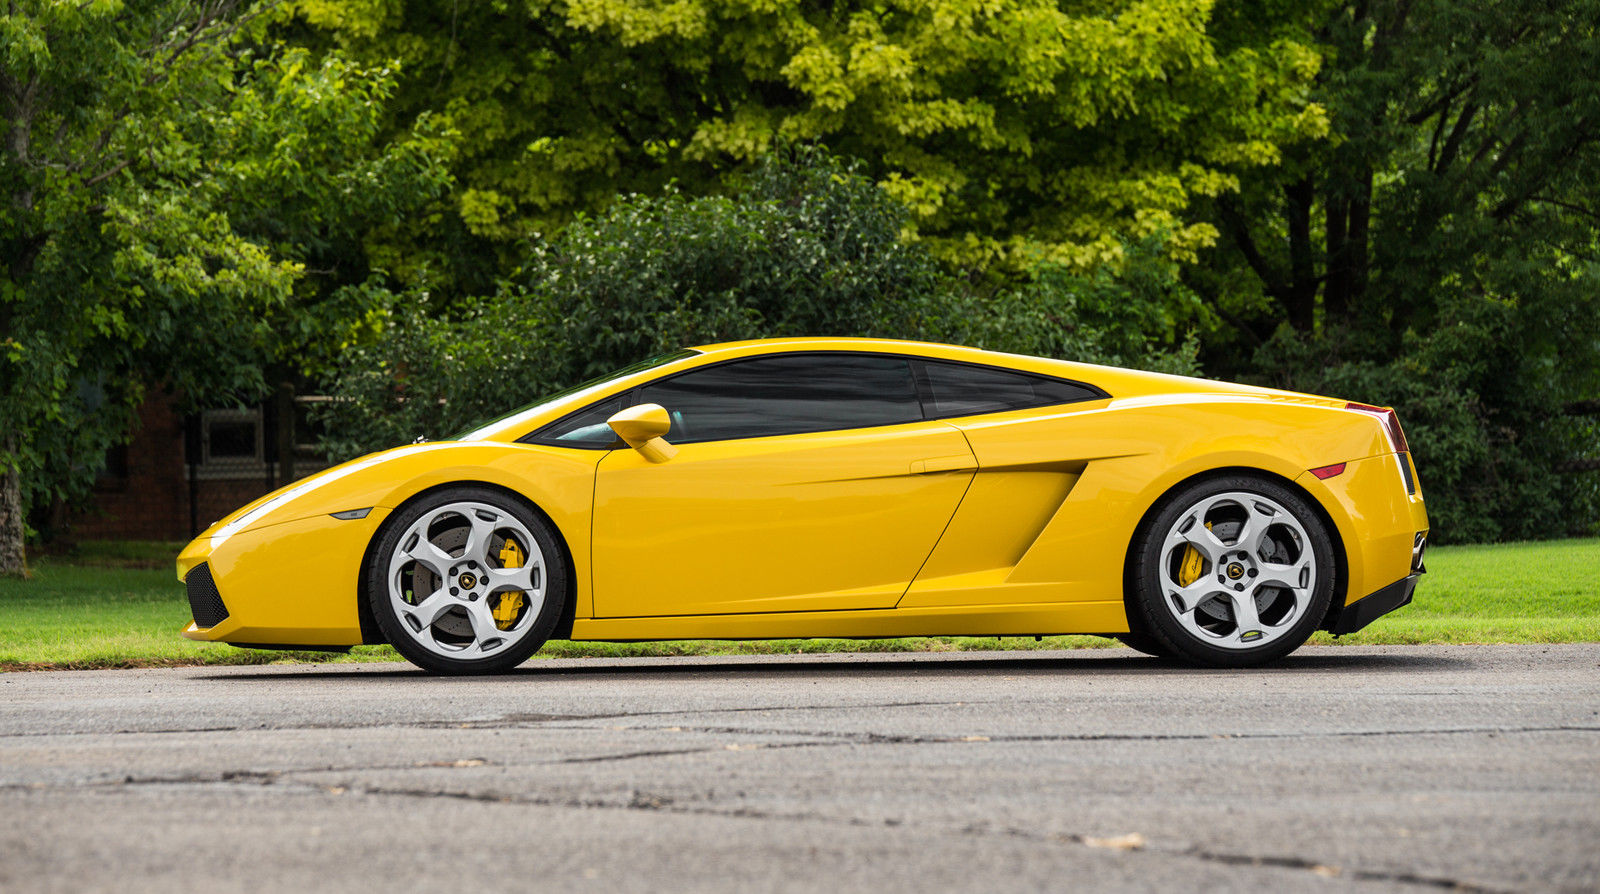 Daily Turismo 2004 Lamborghini Gallardo 6 Speed